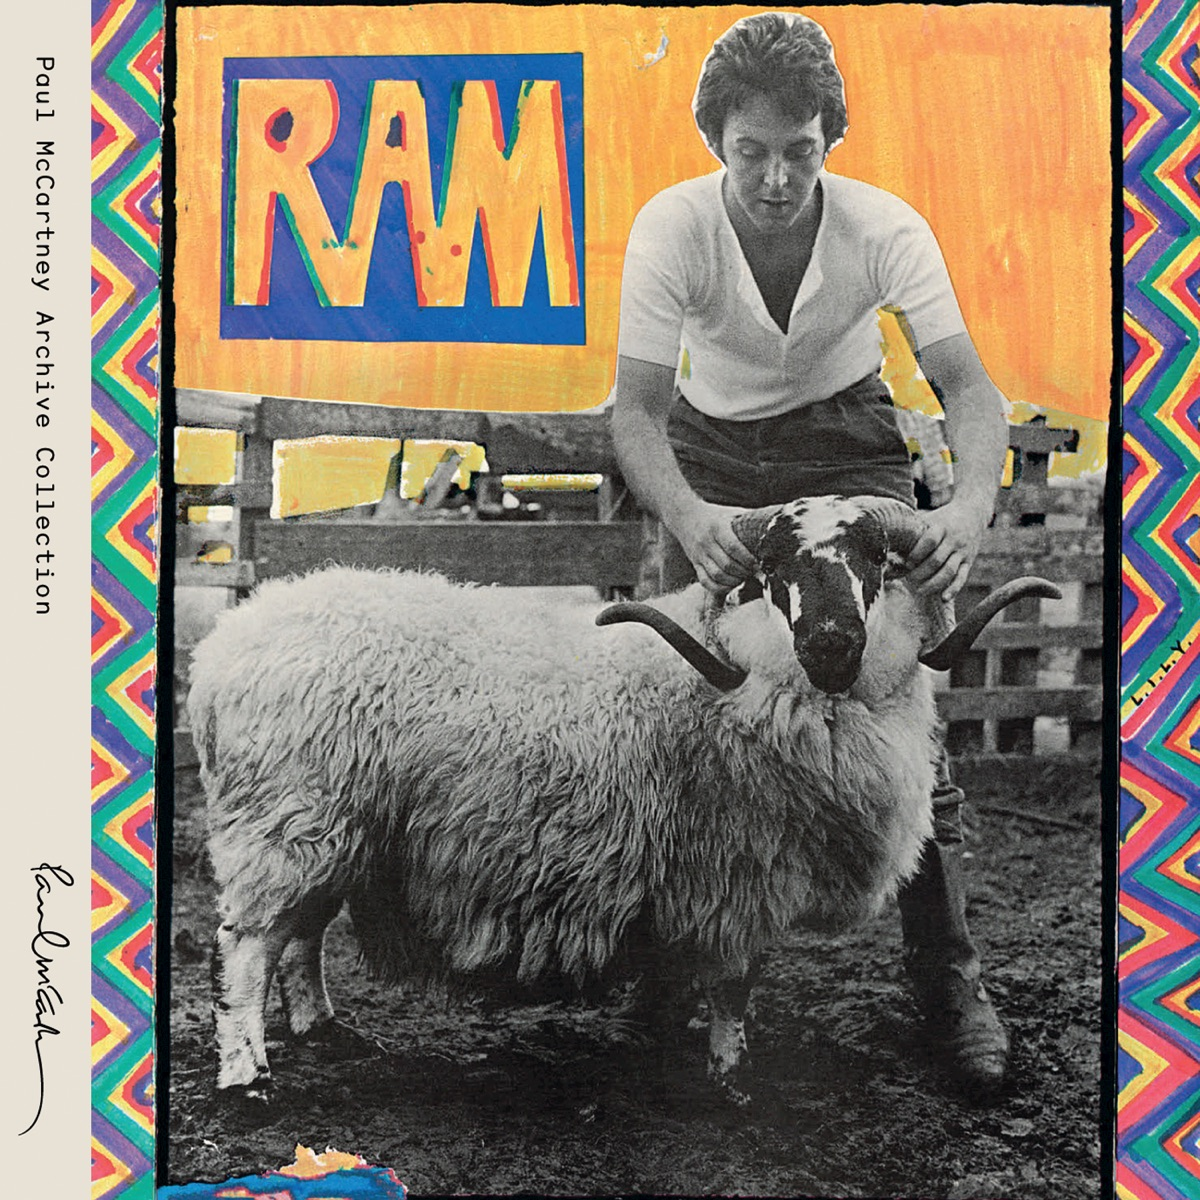 RAM Album Cover by Paul McCartney & Linda McCartney